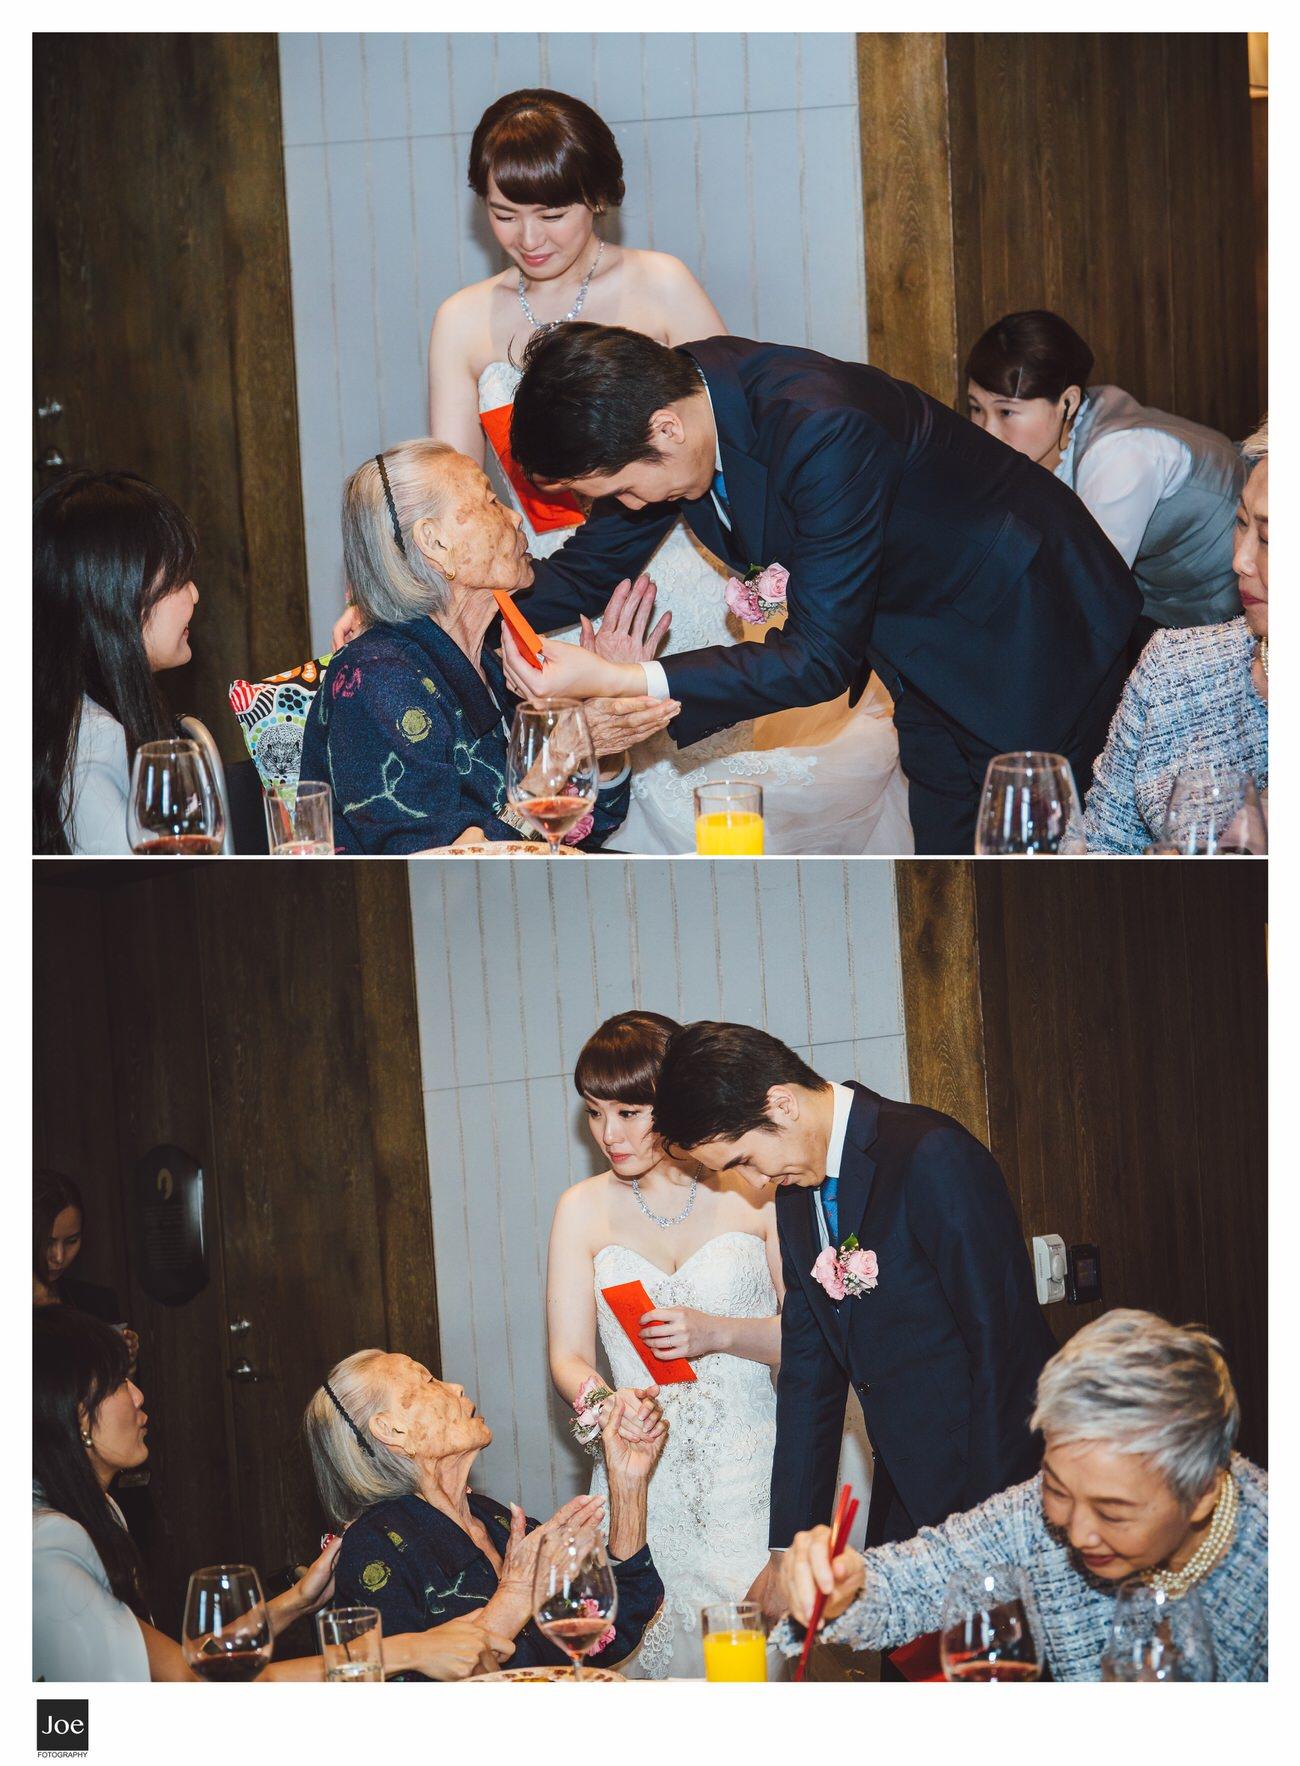 joe-fotography-wedding-photo-palais-de-chine-hotel-034.jpg